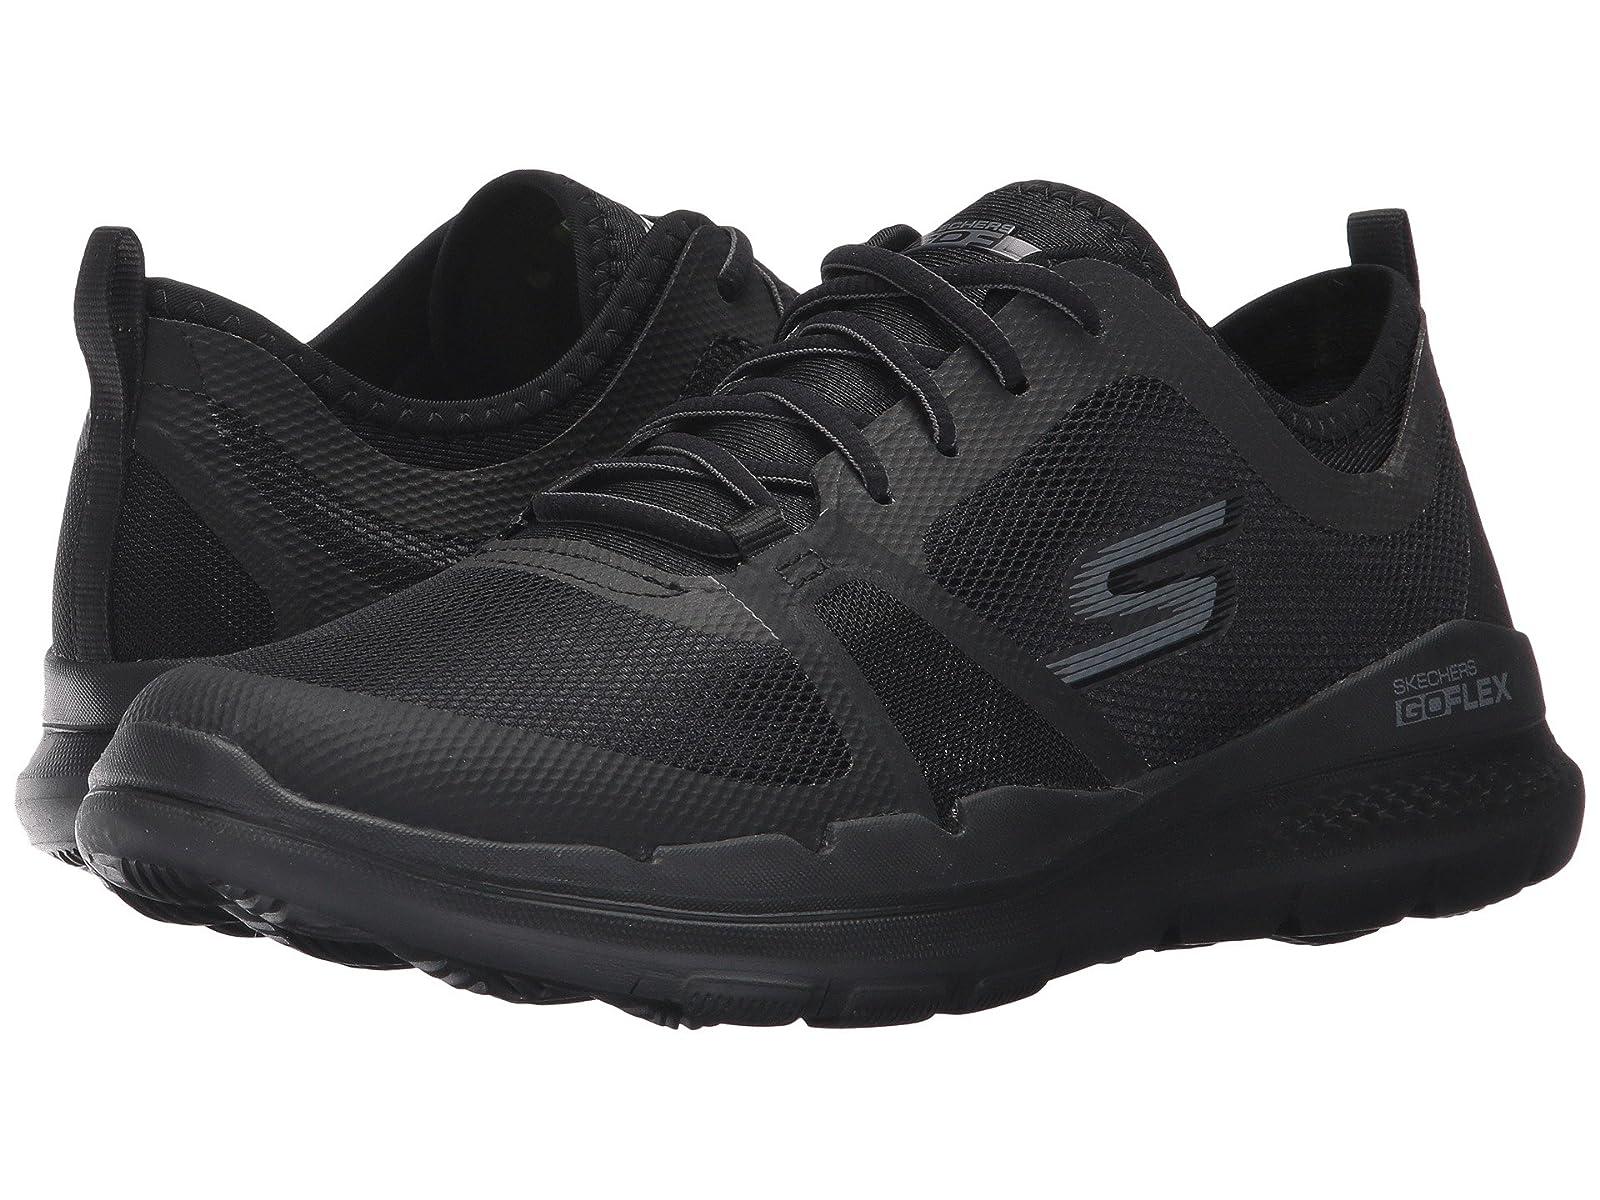 SKECHERS Performance Go Flex Train - ConquerCheap and distinctive eye-catching shoes